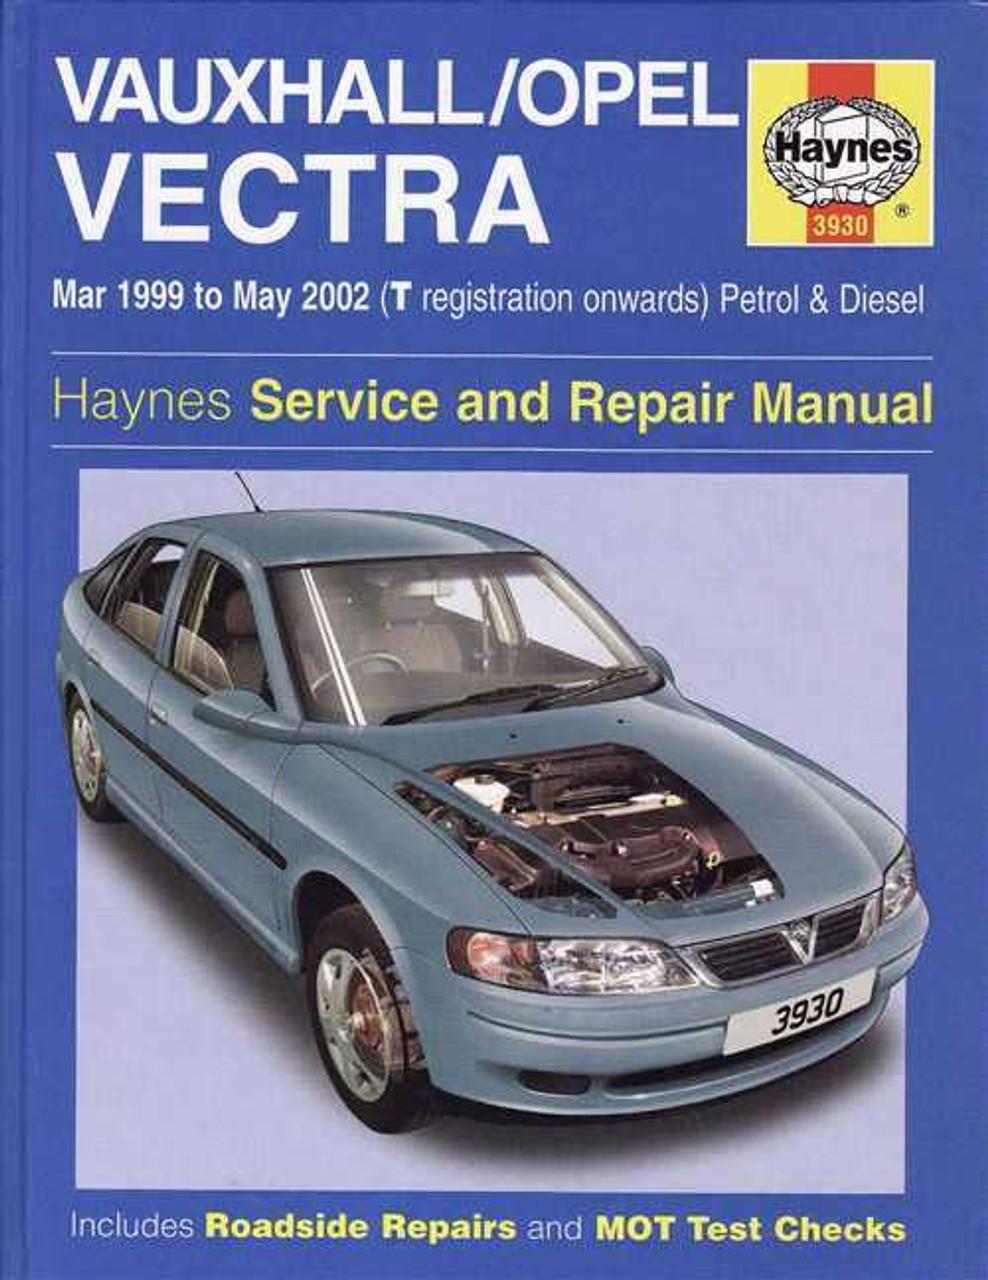 holden vectra vauxhall opel 1999 2002 workshop manual rh automotobookshop com au Vauxhall Astra Vauxhall Tigra